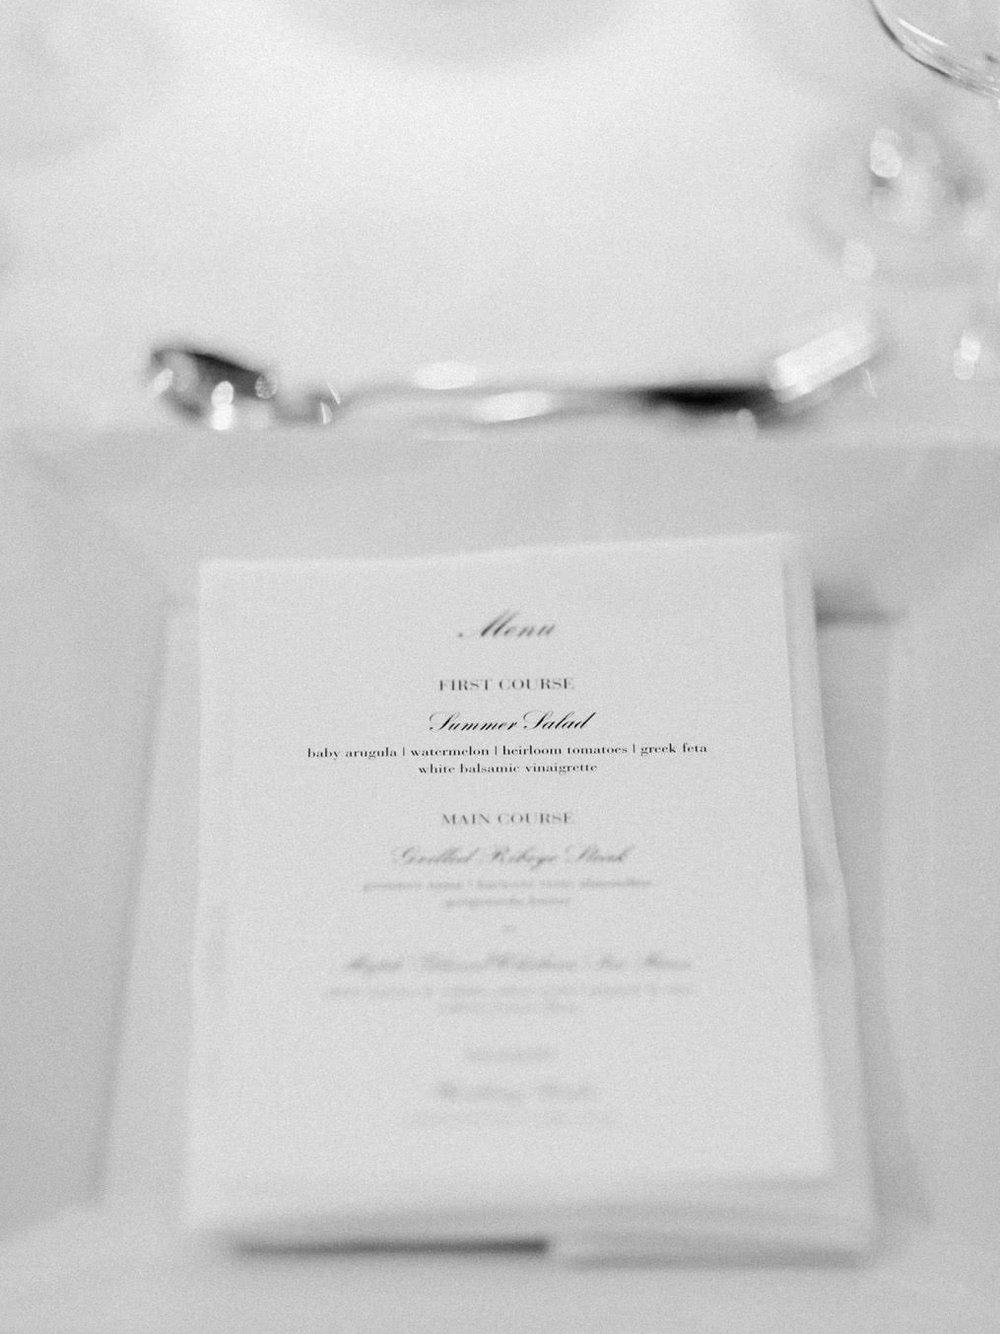 Elegant and crisp, classic black and white wedding dinner menu